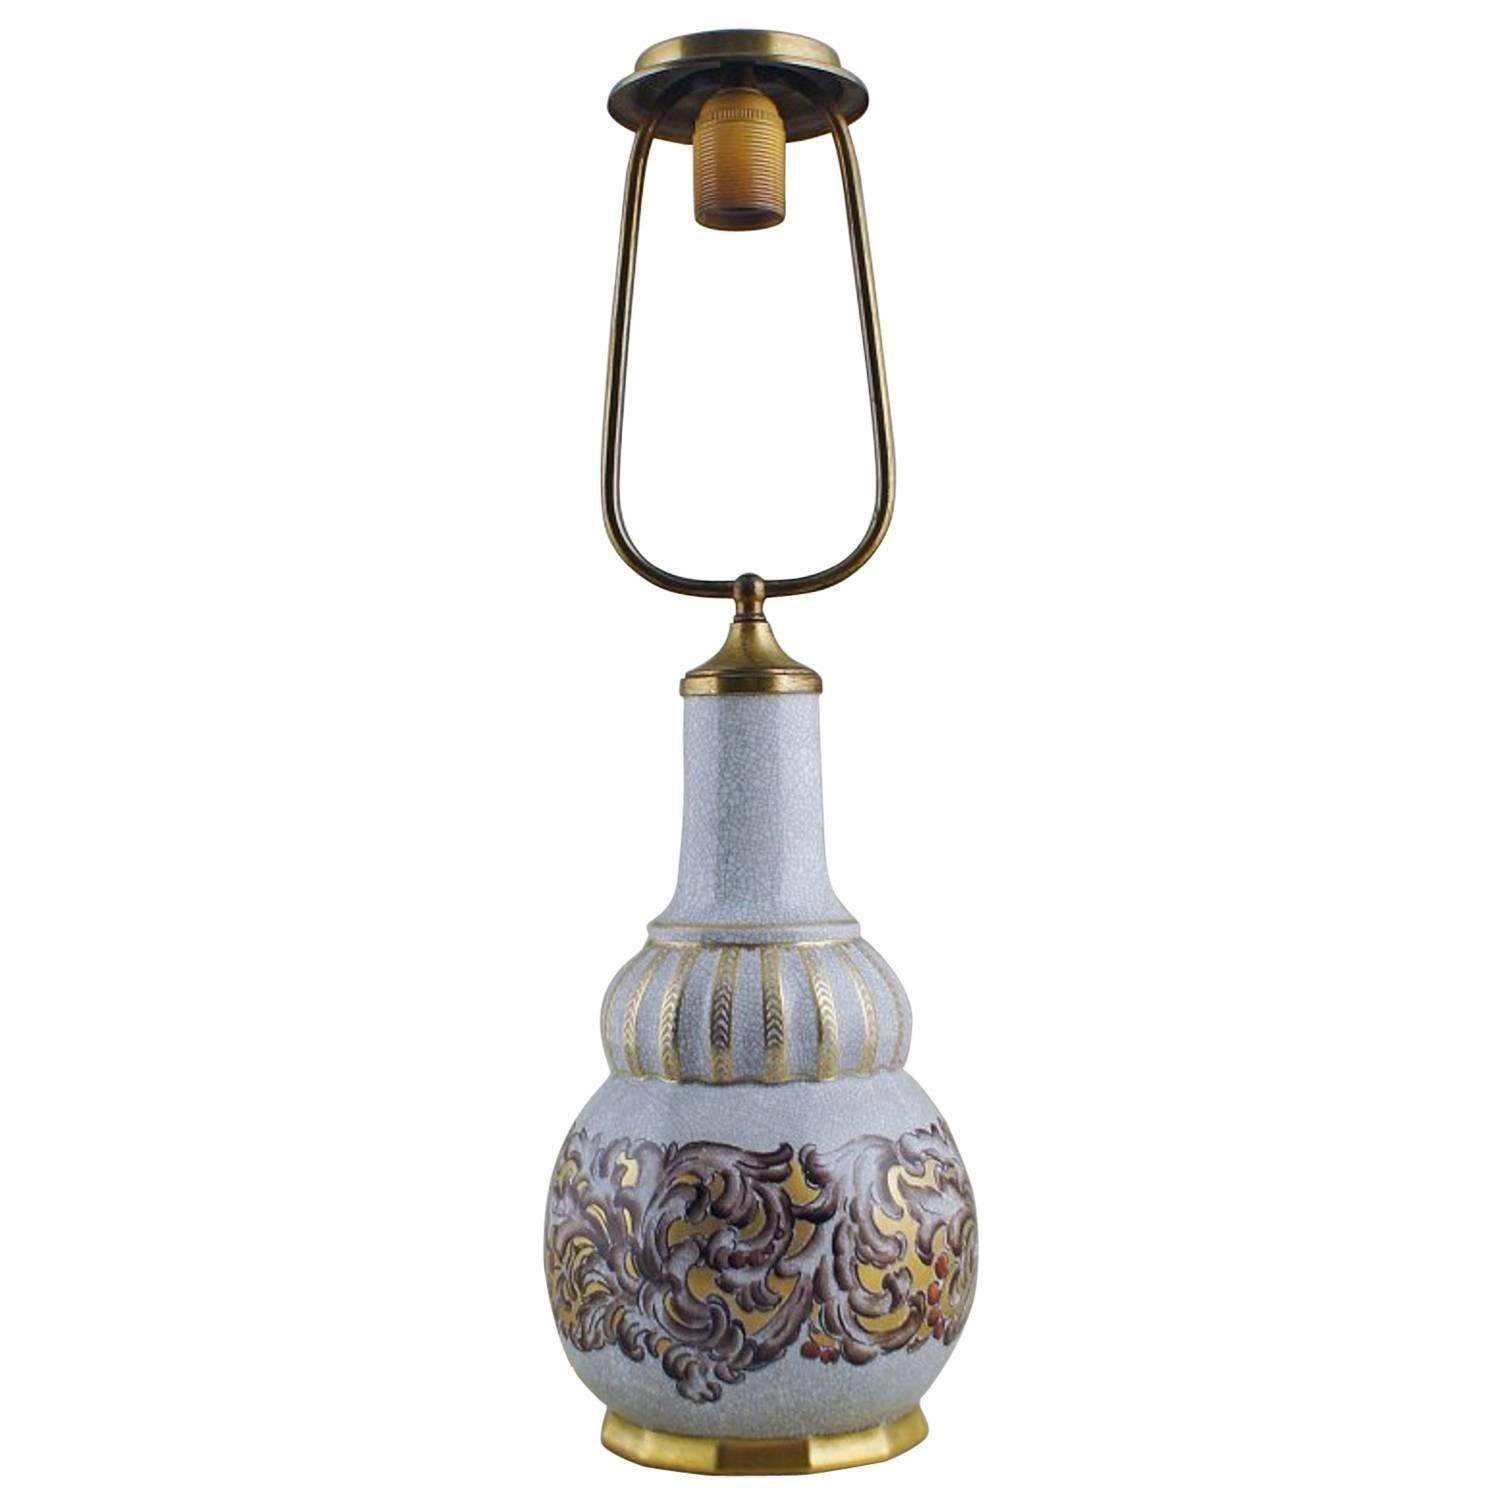 Dahl Jensen Table Lamp Crackle Porcelain, Decorated in Gold